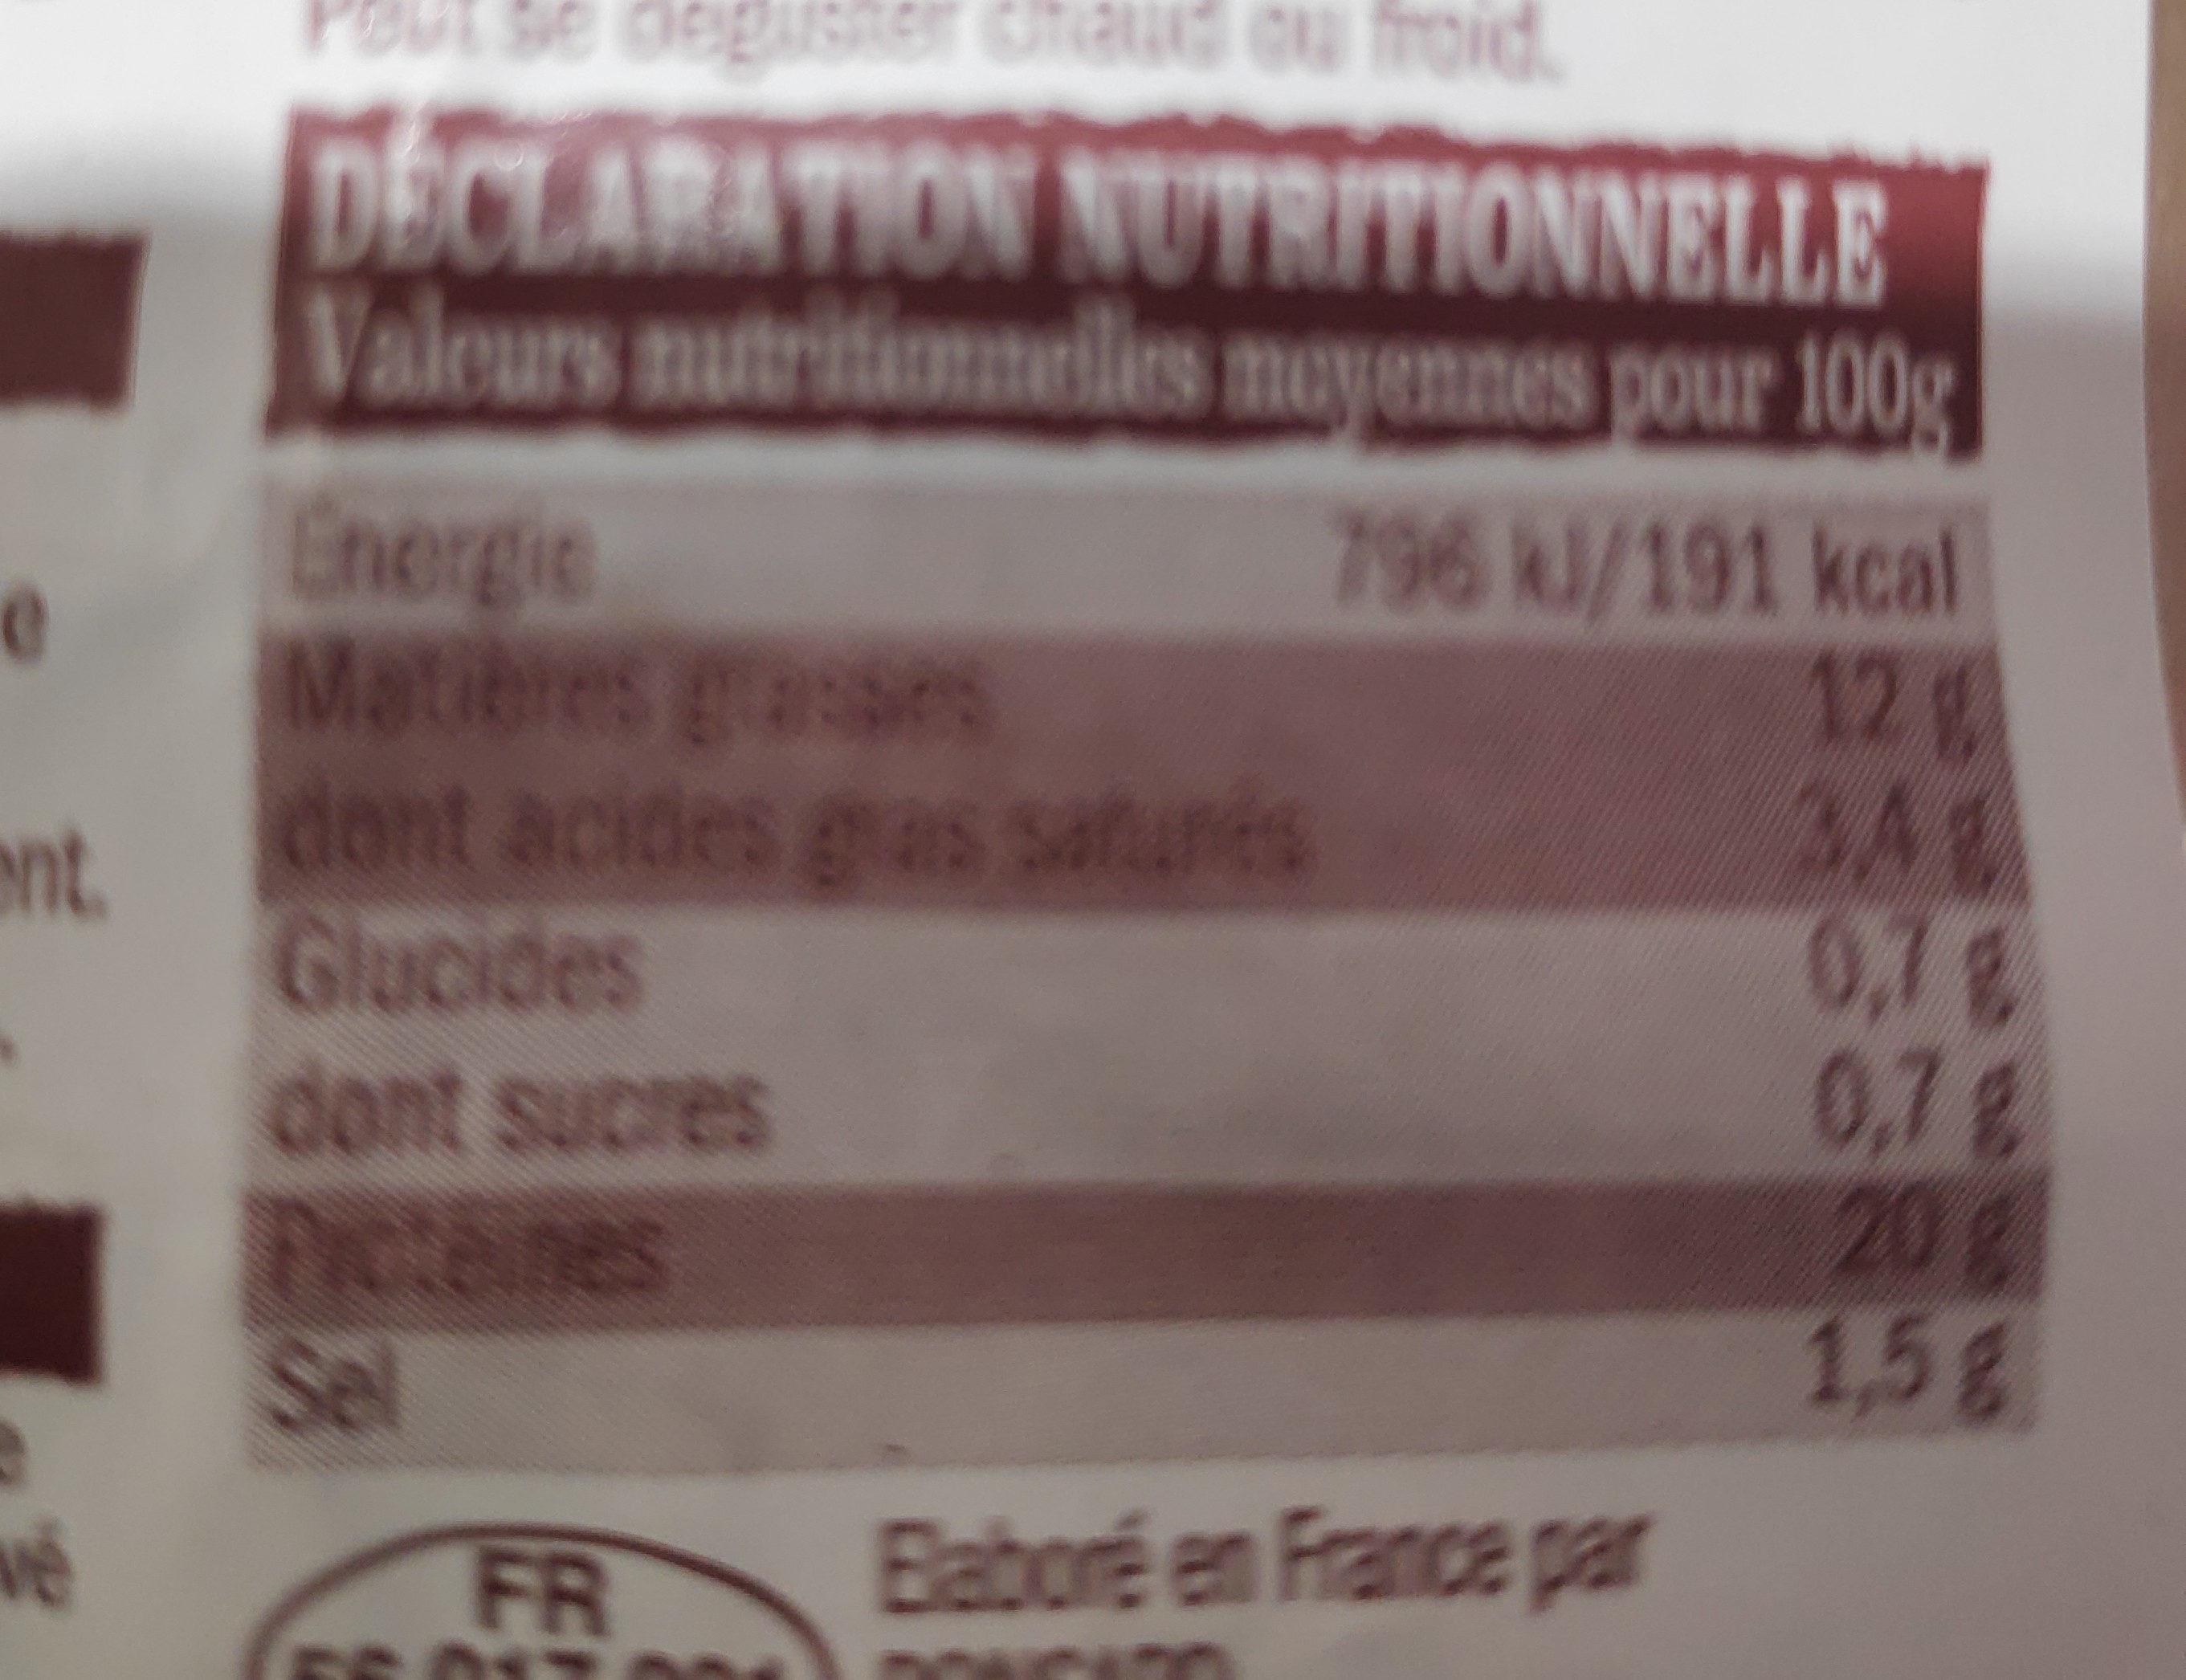 Poulet fumé - Voedingswaarden - fr